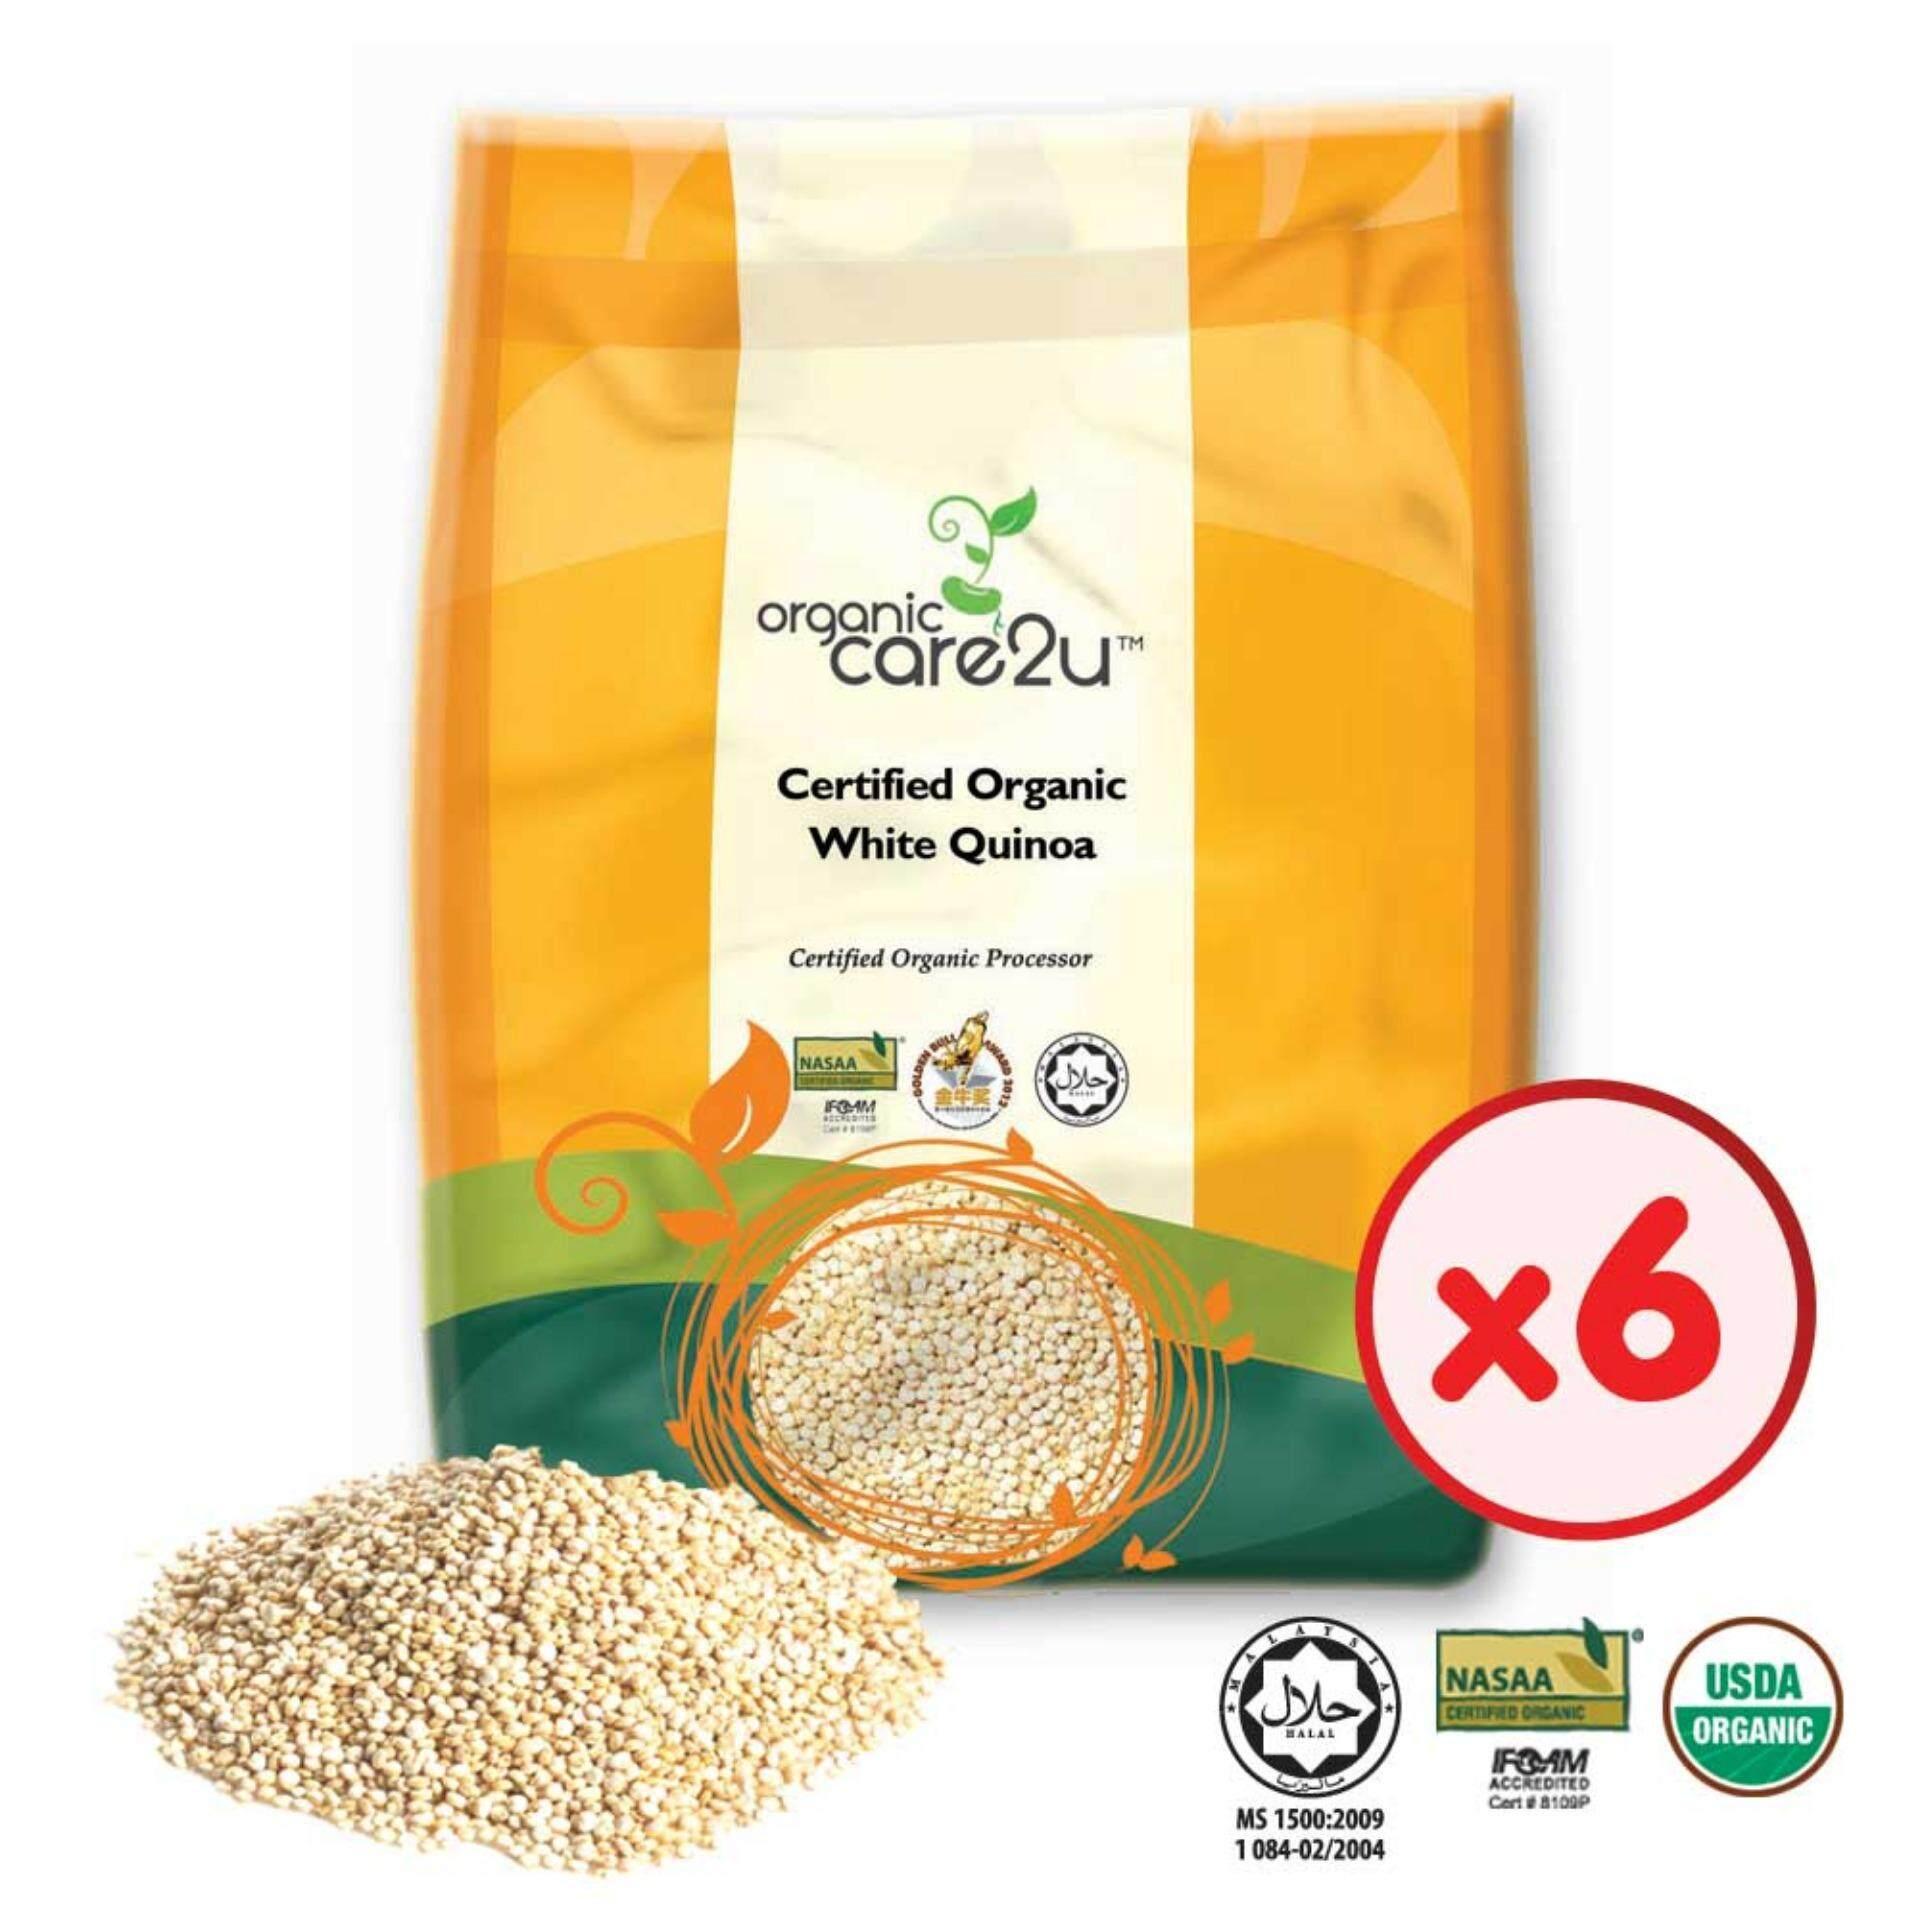 Organic Care2u Organic White Quinoa (400g) - [Bundle of 6]